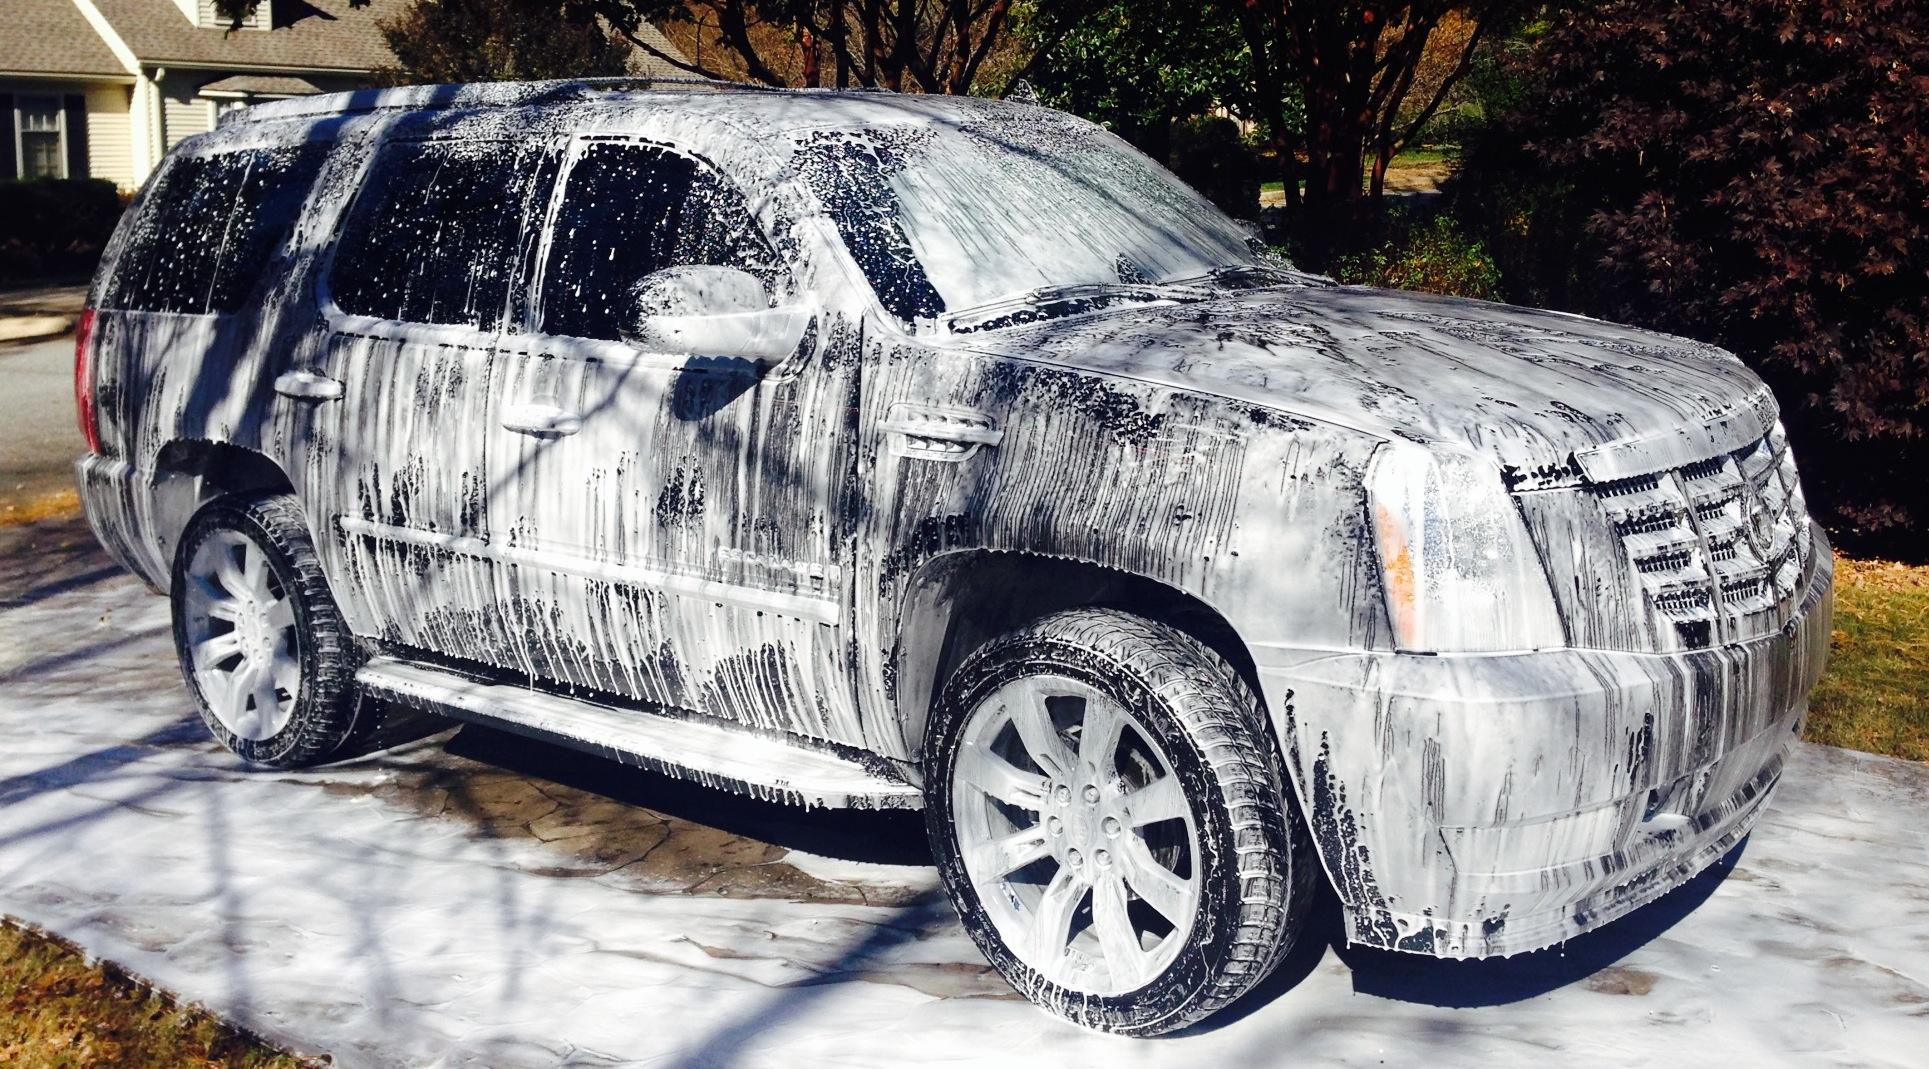 ACME Mobile Detail – Car Wash & Detailing – Greenville SC Home